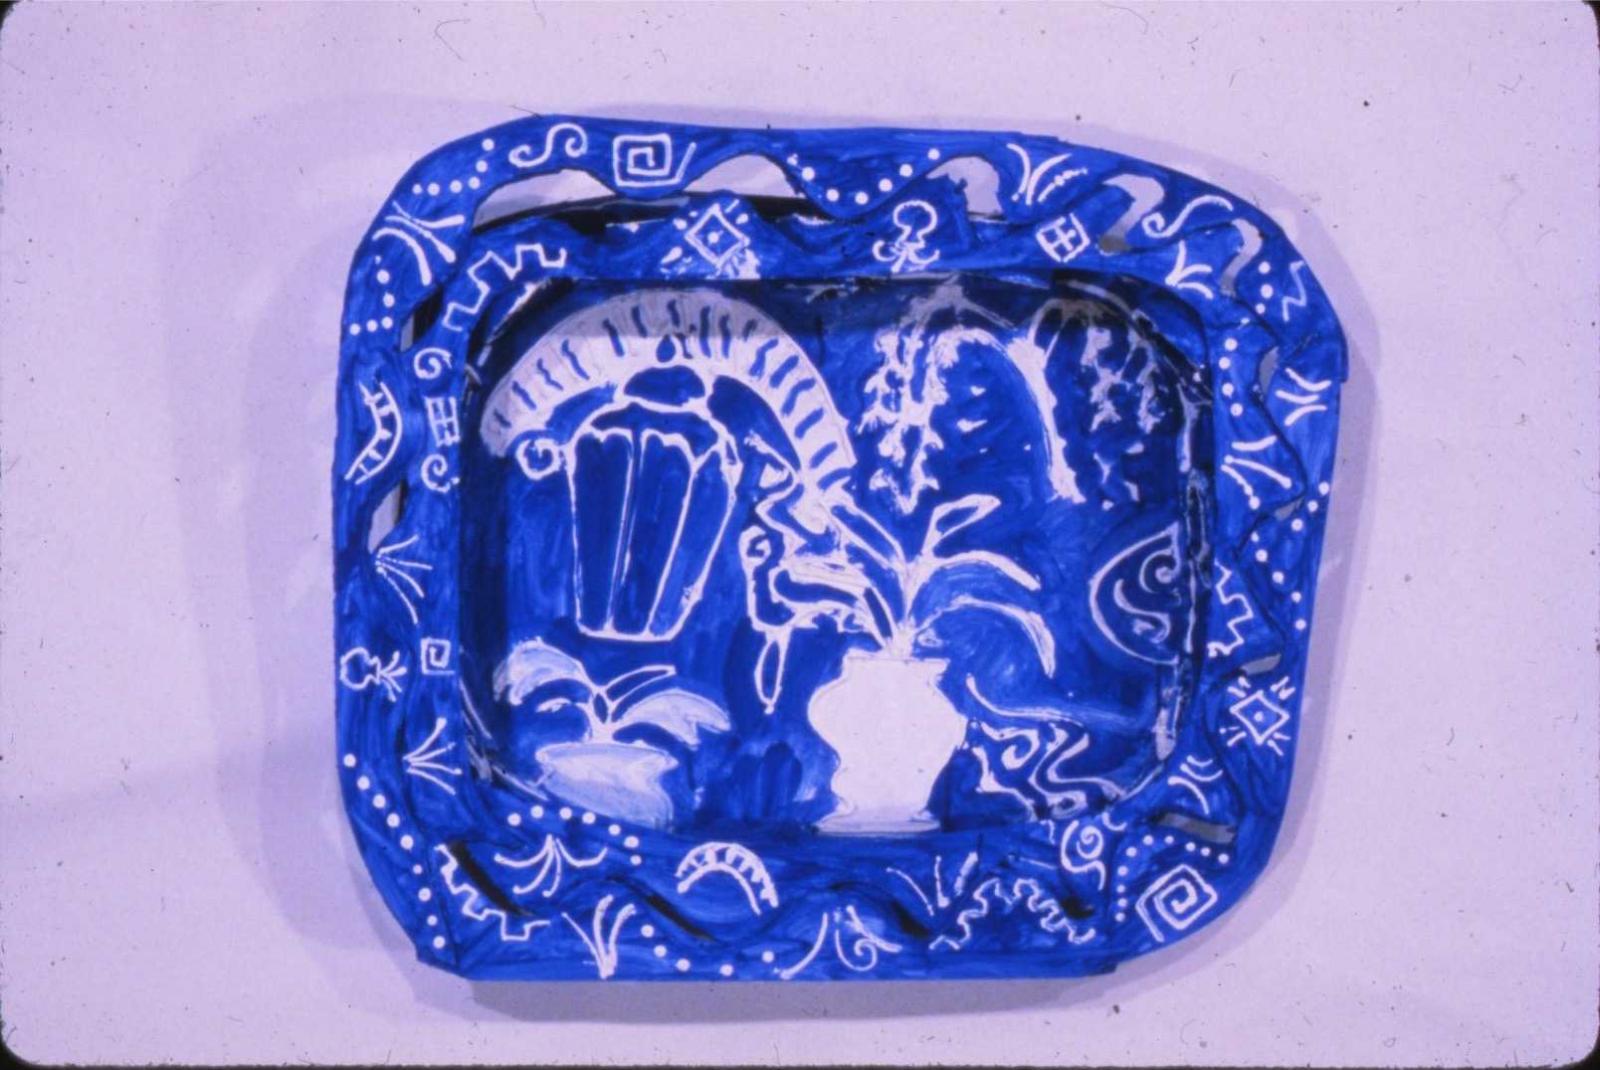 "Blue China Plate 1982 Foam-cor, gesso, Muralo paint 24"" H x 20"" W x 6"" D Collection of the Danforth Art Musem"